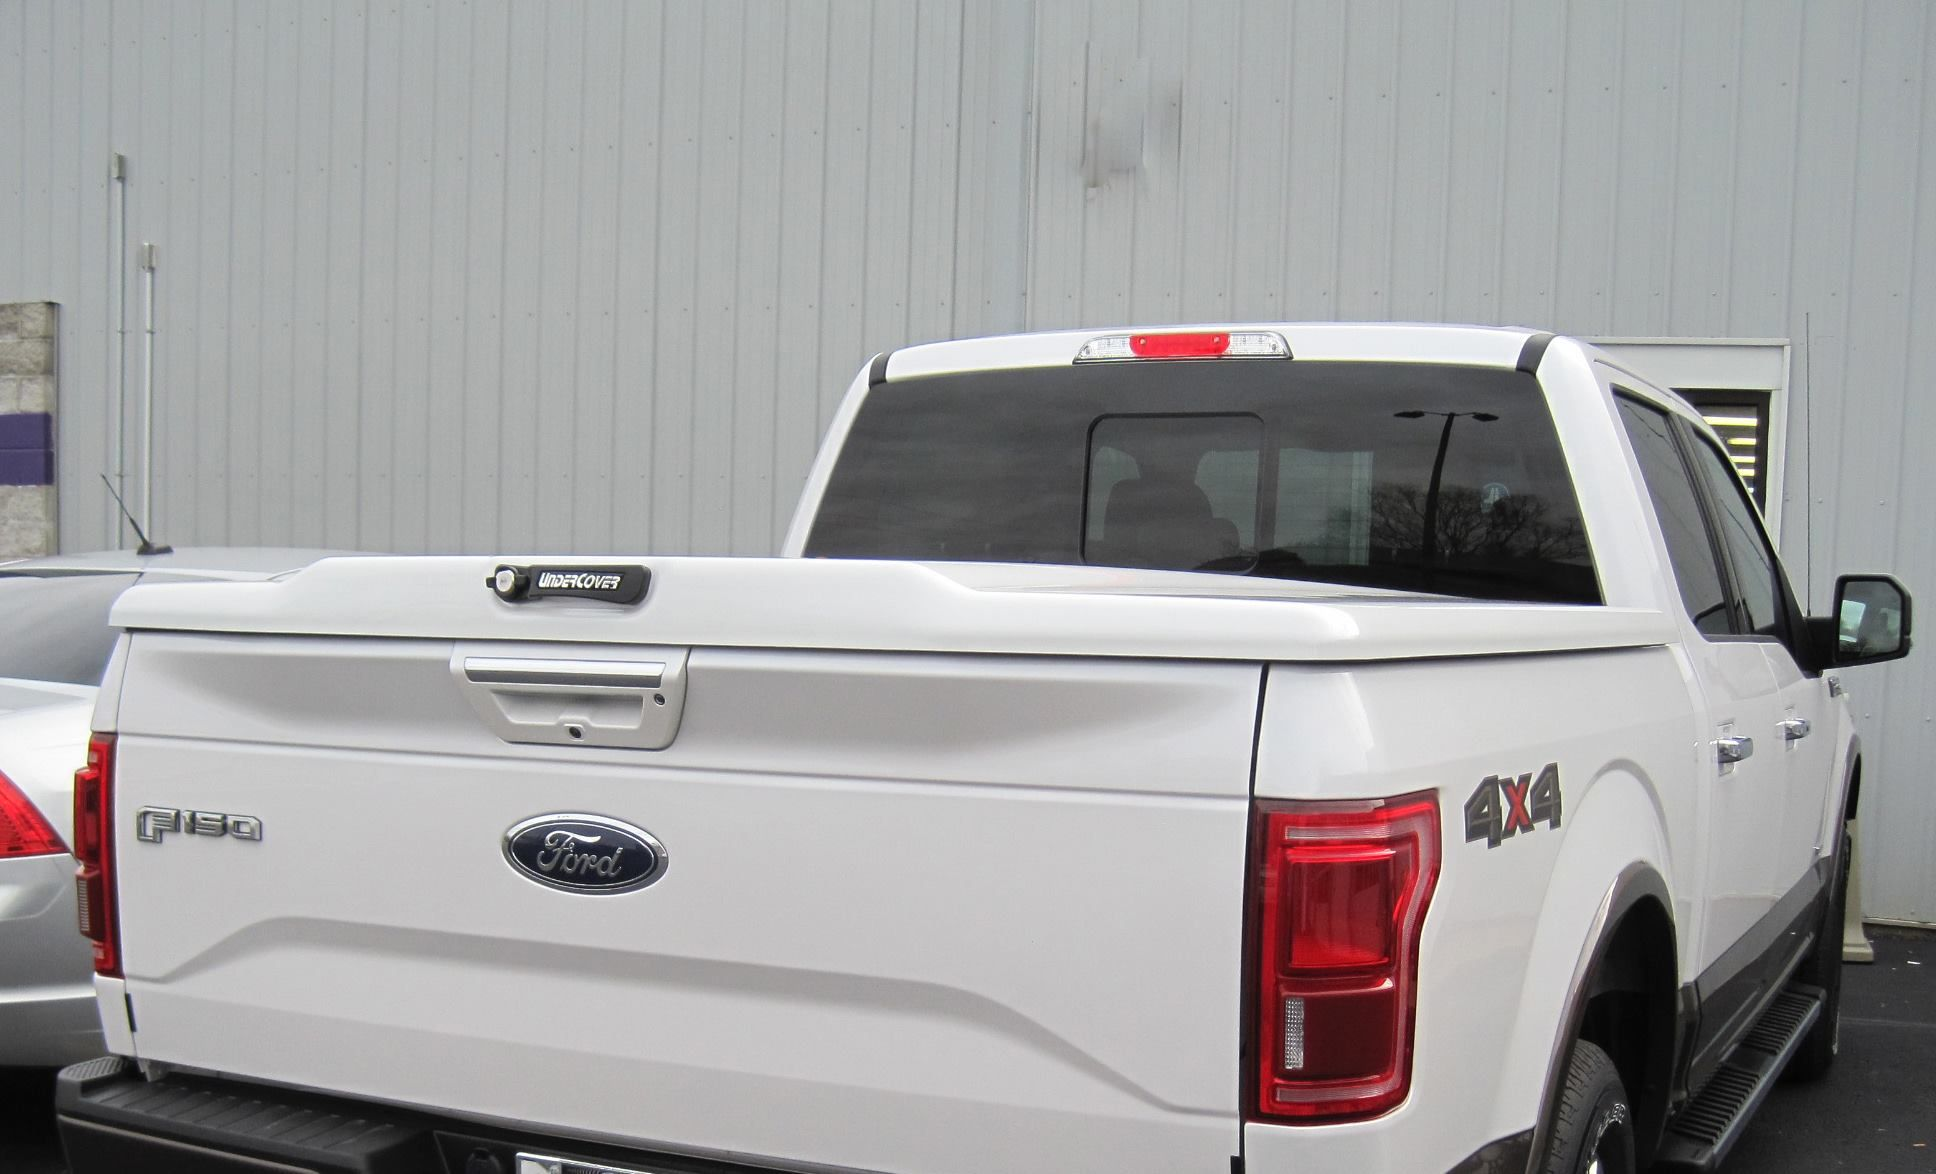 UnderCover Tonneau Covers Elite LX installed on Aluminum